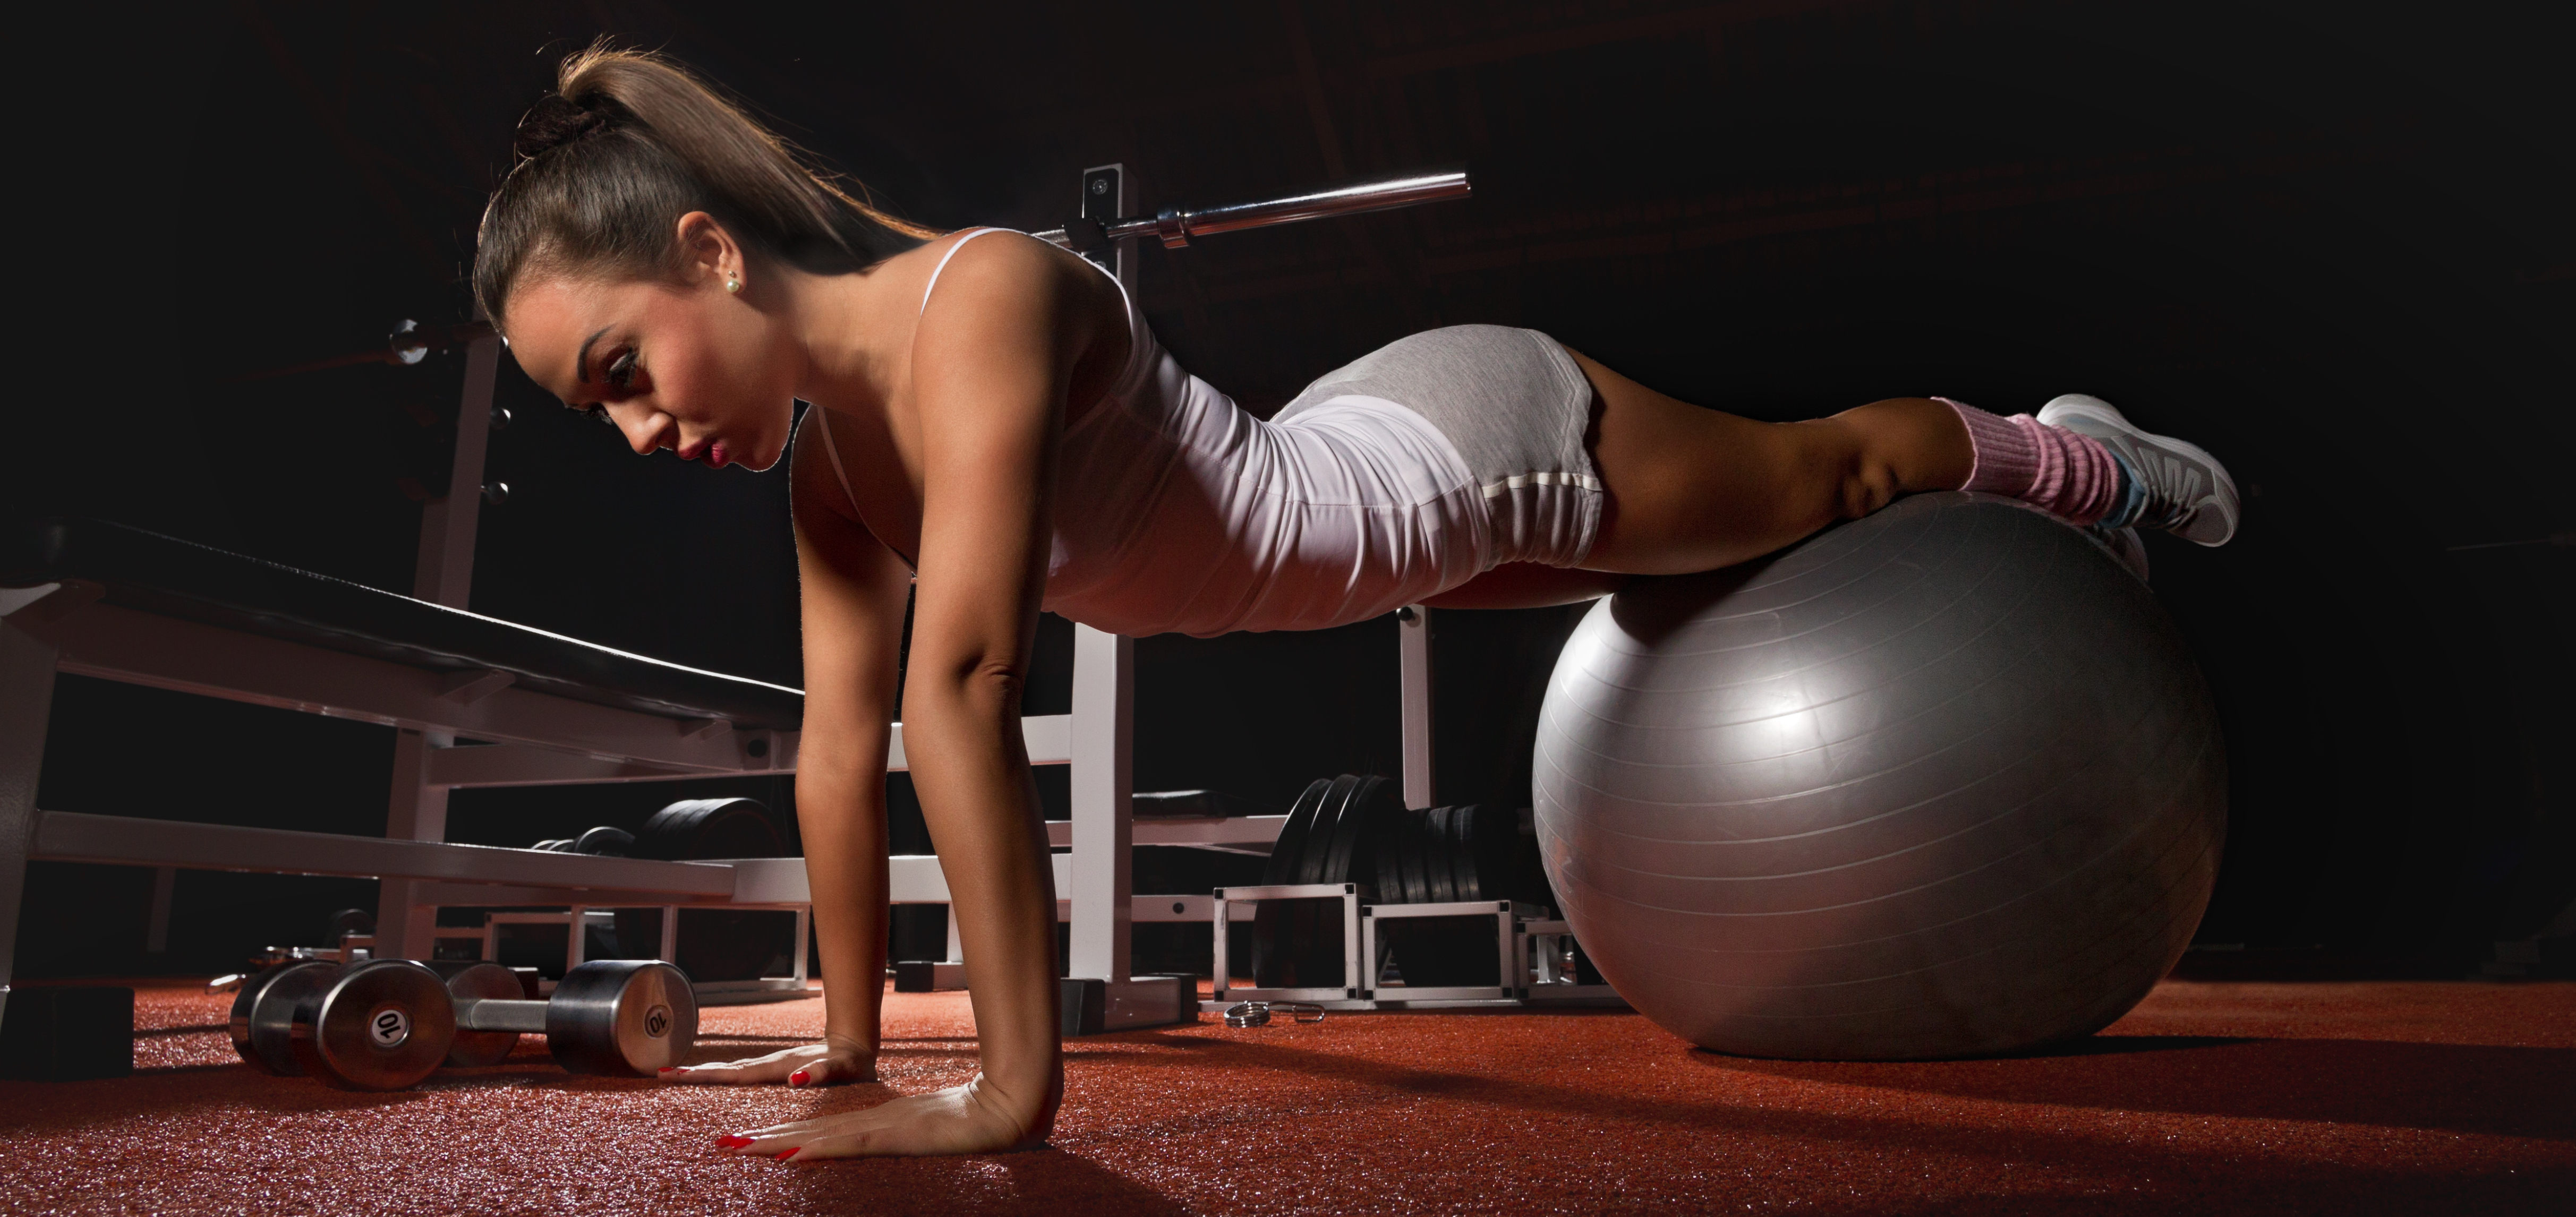 fitness girl 4k ultra hd wallpaper background image 4850x2292